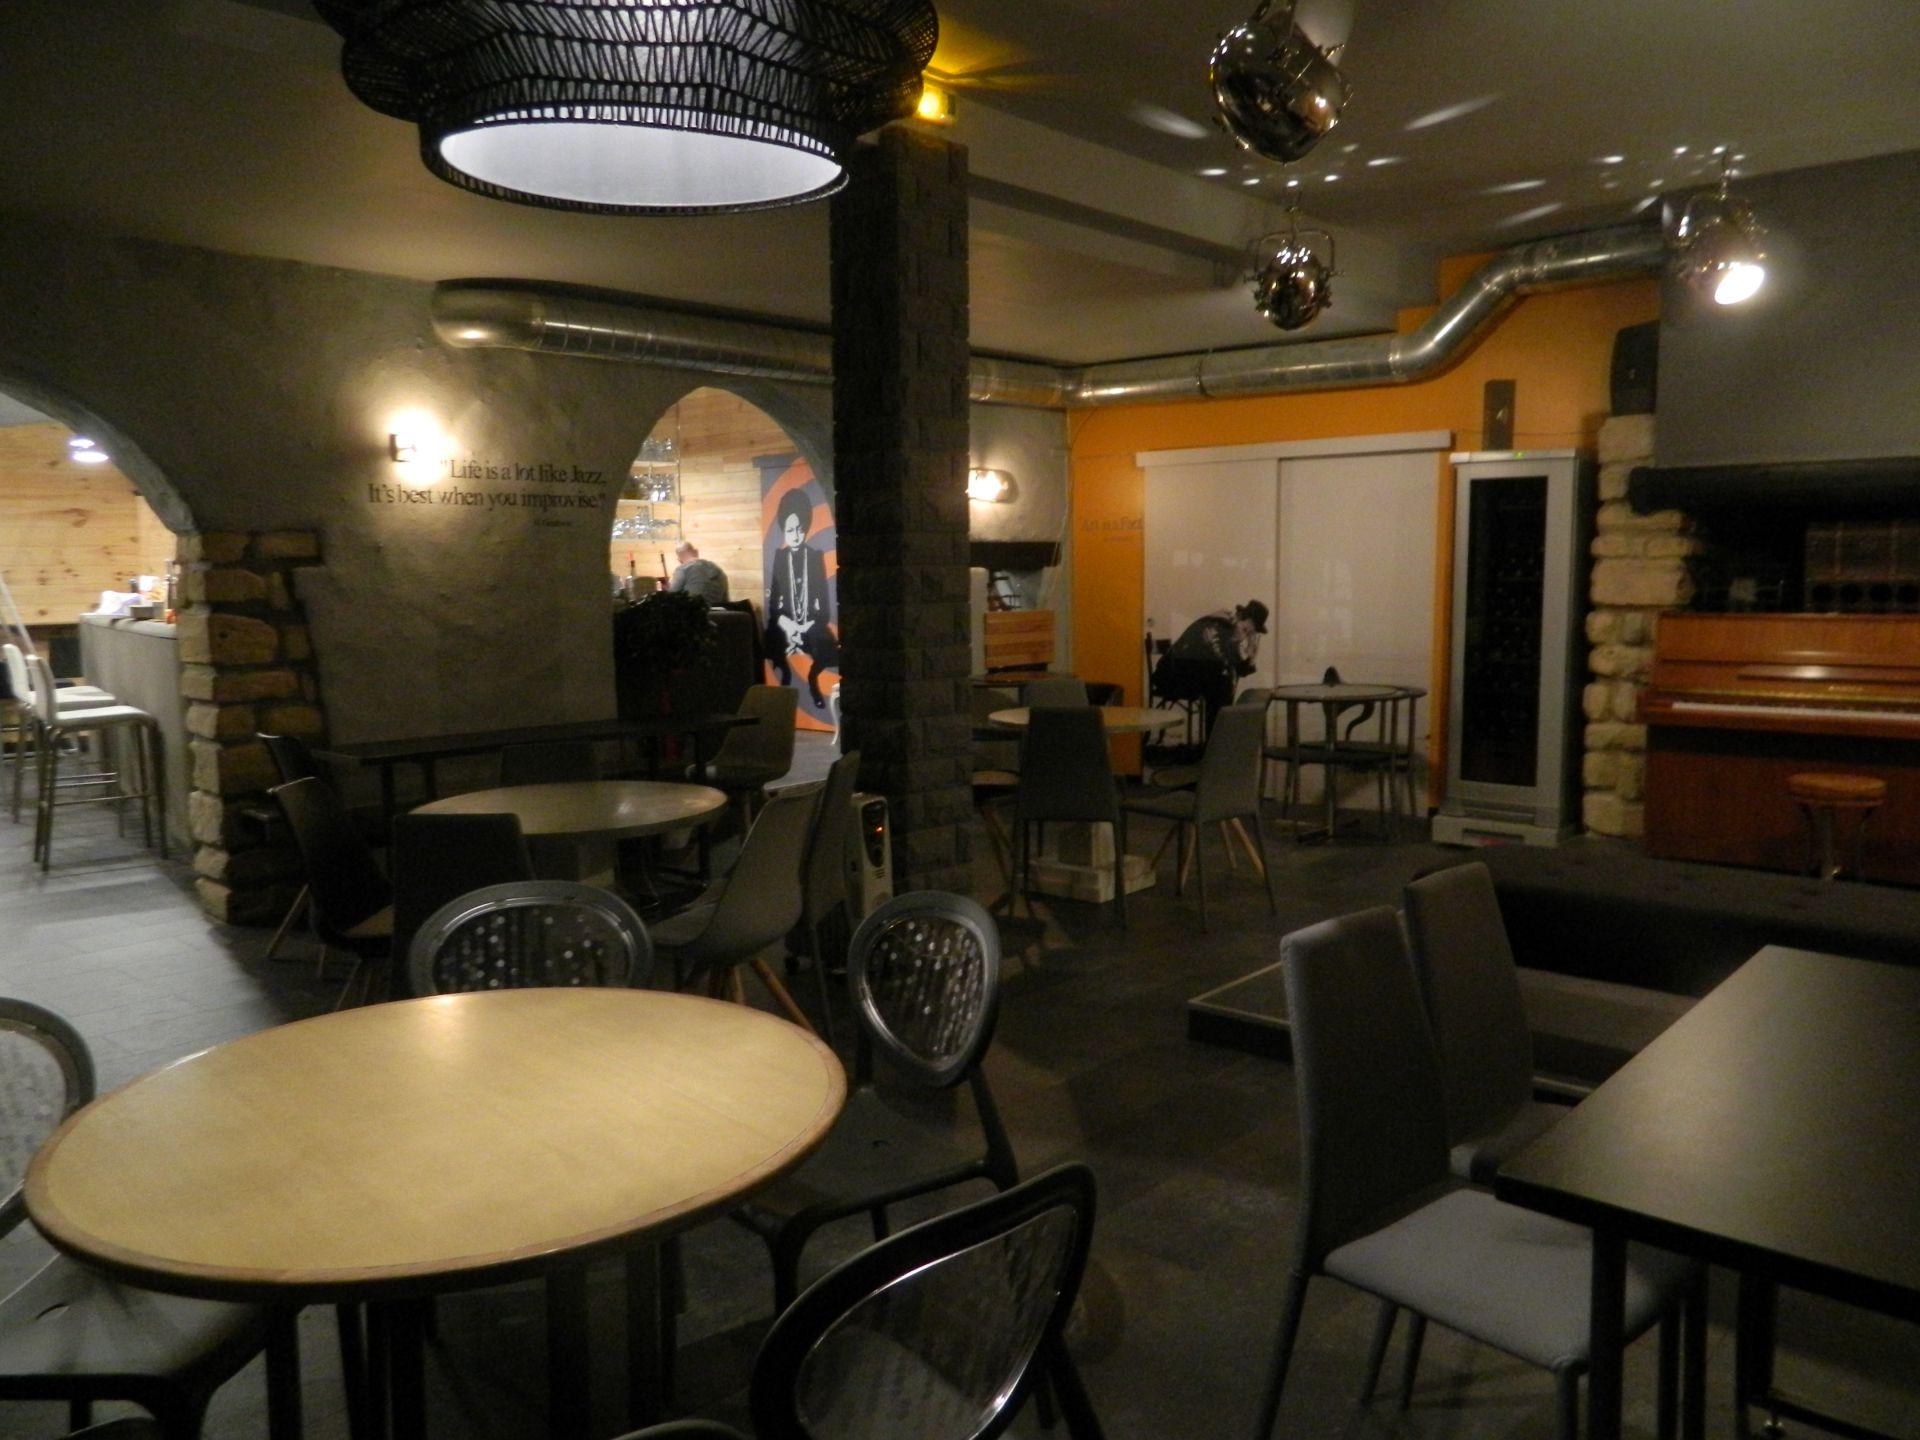 wine note club jazz lorraine tourisme. Black Bedroom Furniture Sets. Home Design Ideas